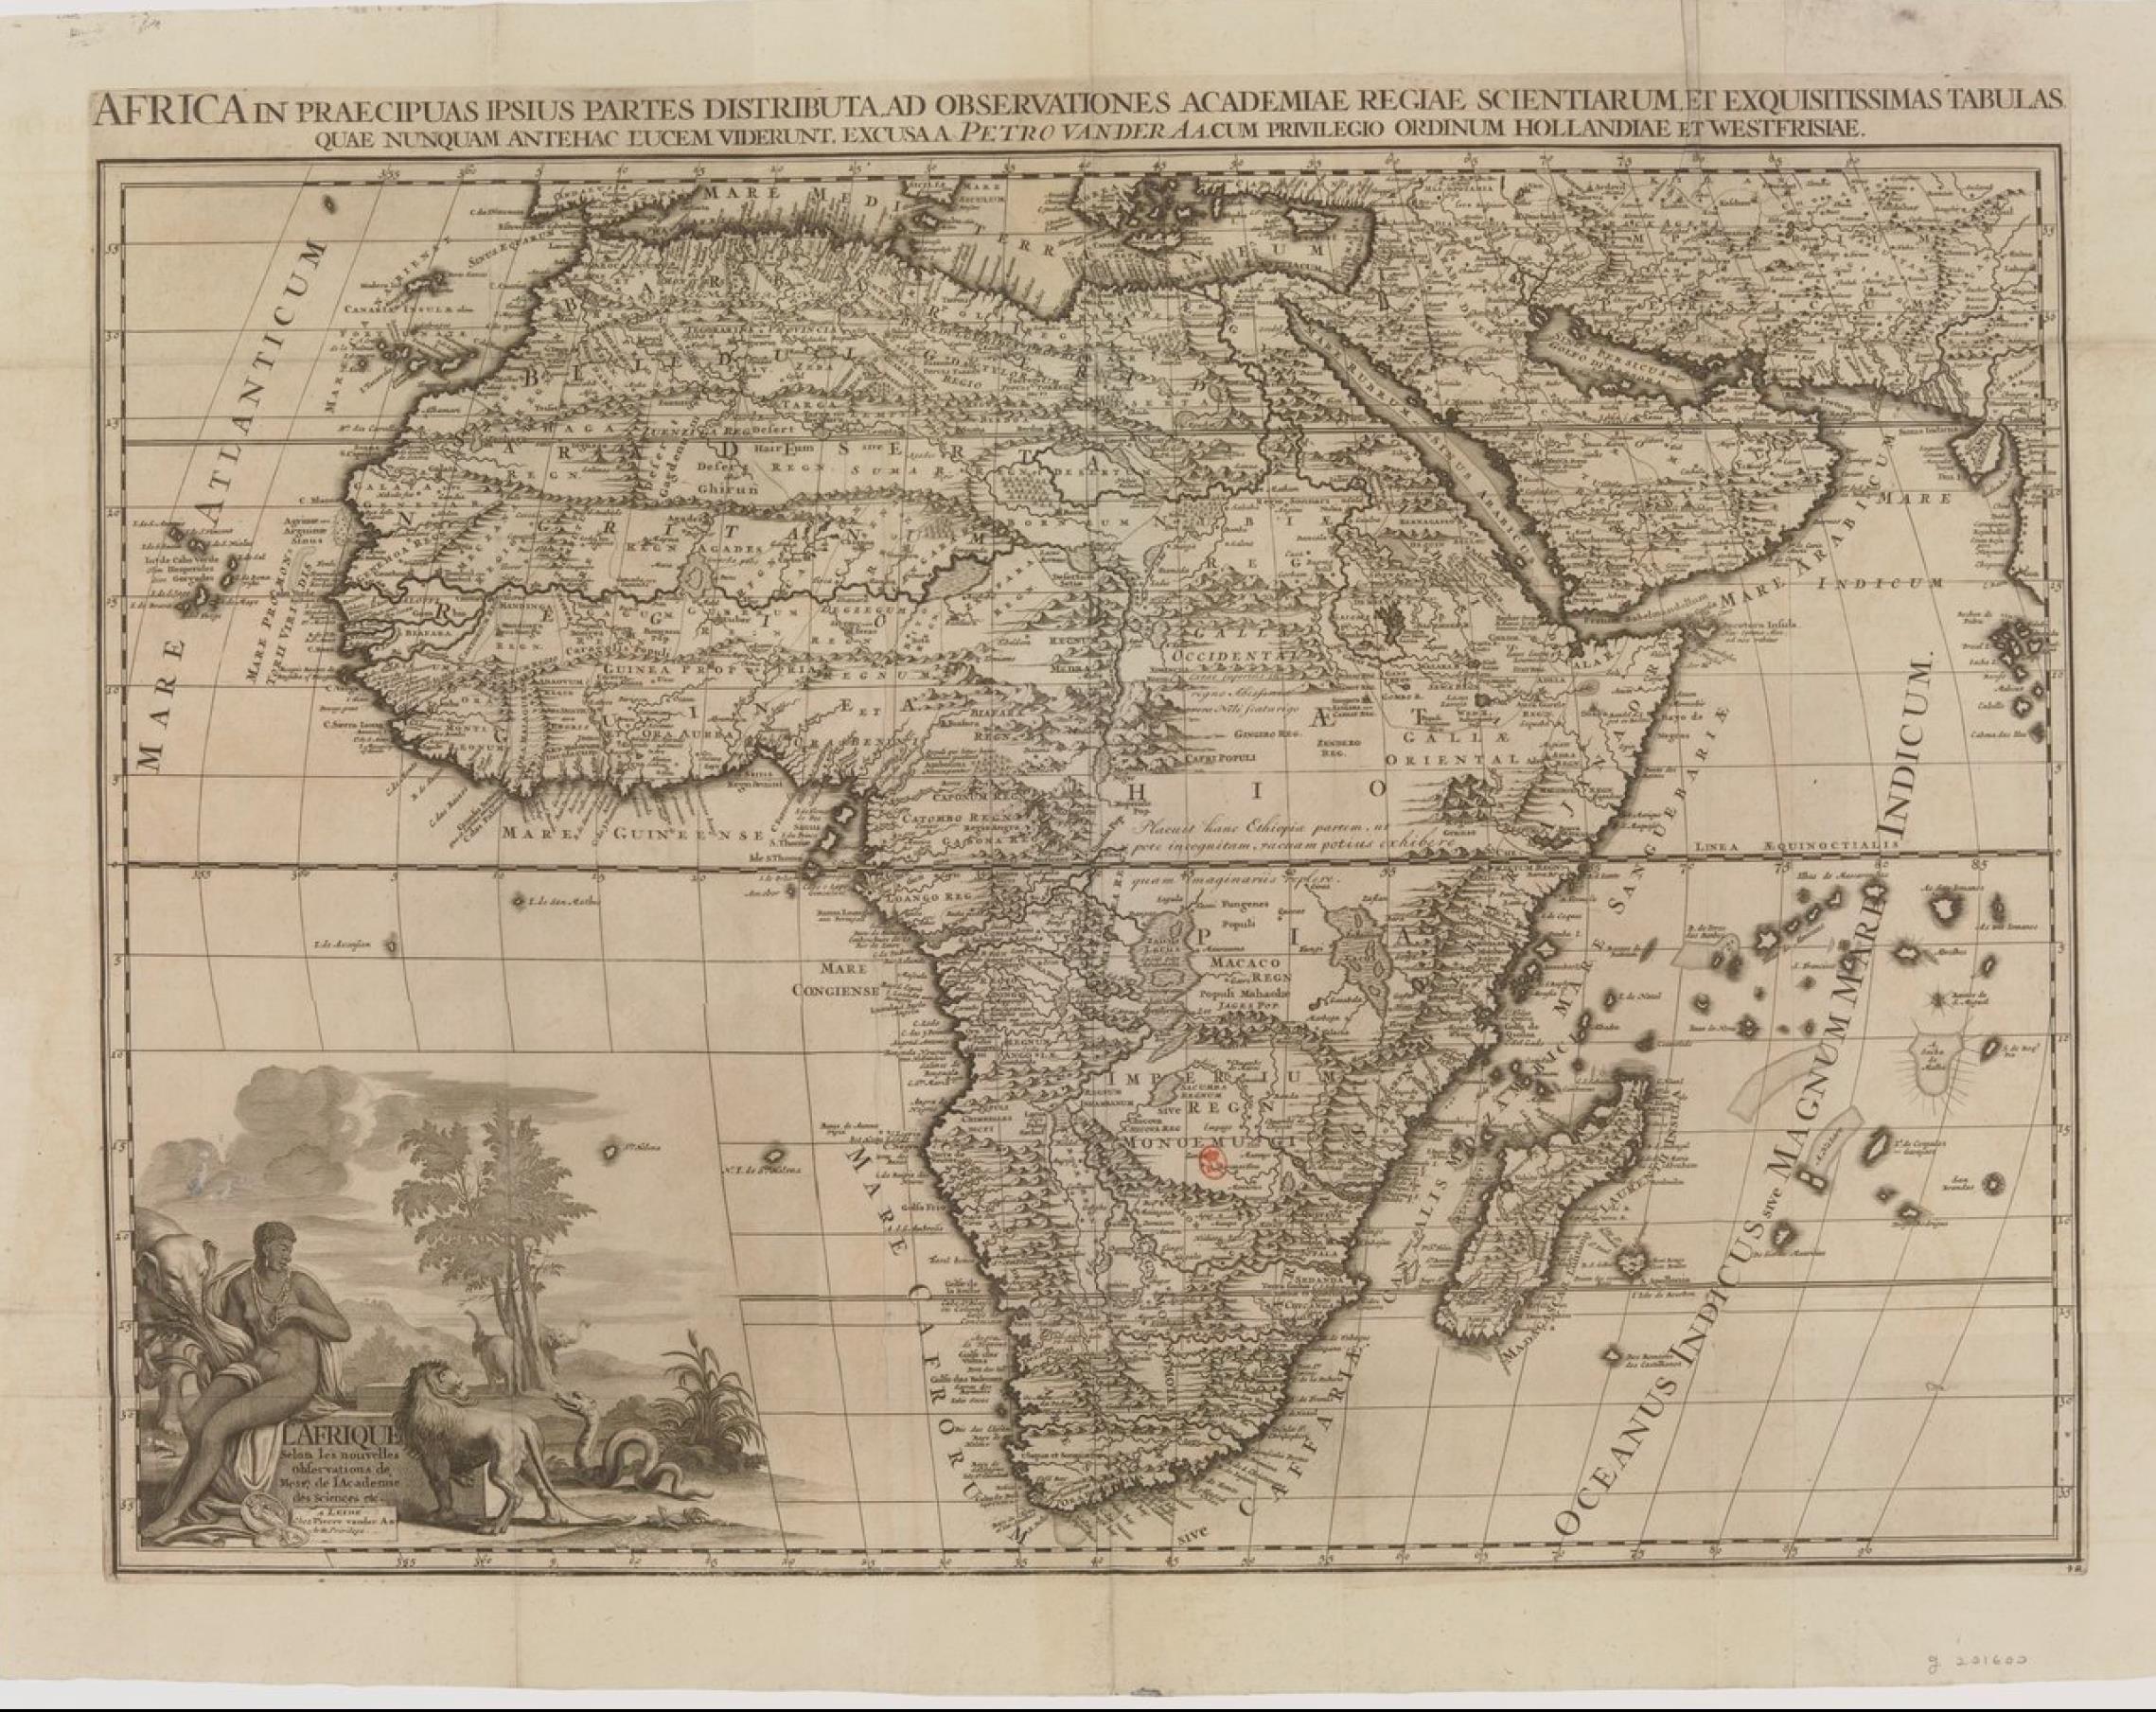 02. Карта Африки